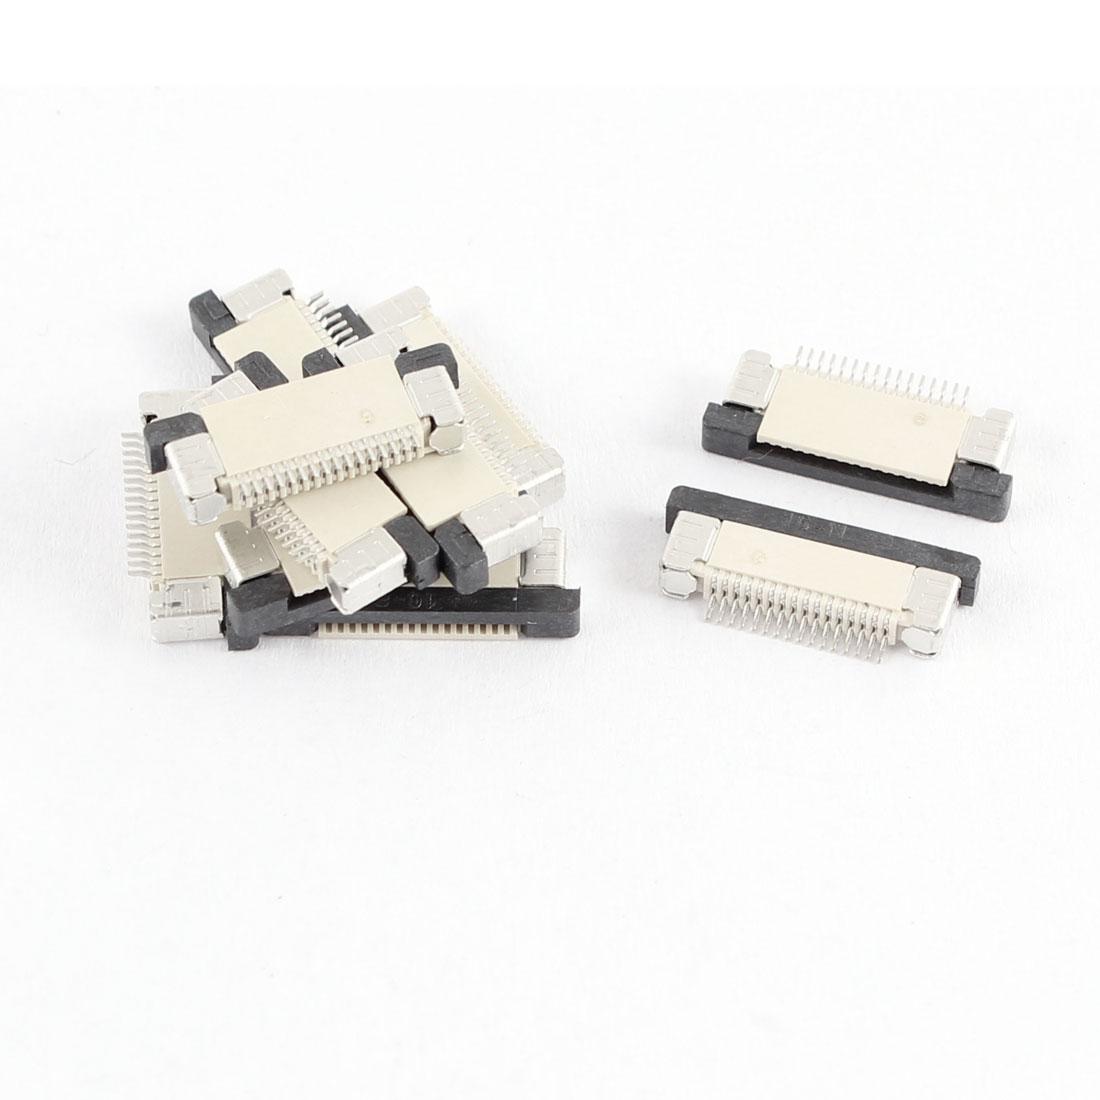 10Pcs Bottom Port 16Pin 0.5mm Pitch FFC FPC Ribbon Sockets Connector